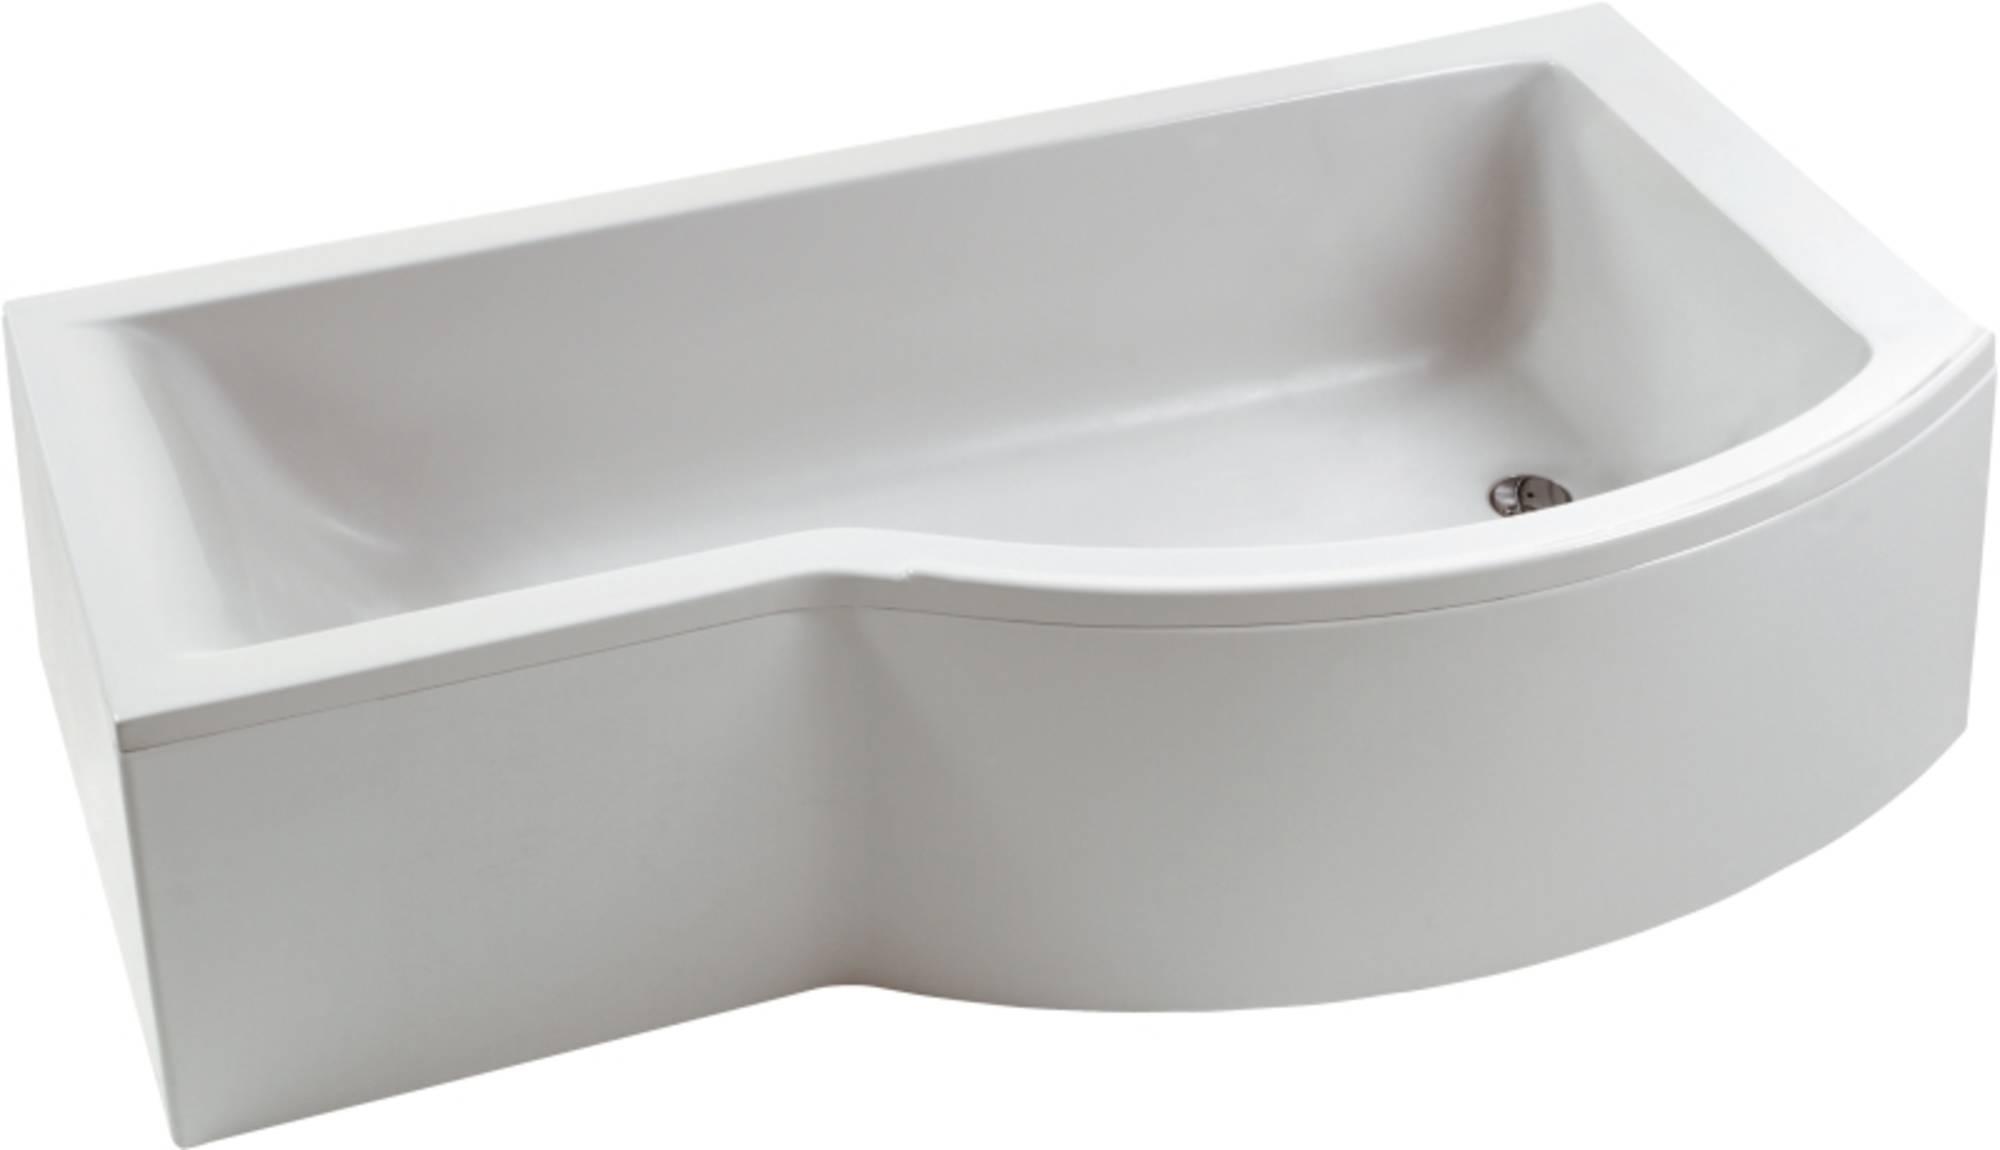 Ideal Standard Connect bad 170x70 cmmet douchezone rechts en ideal waste Wit